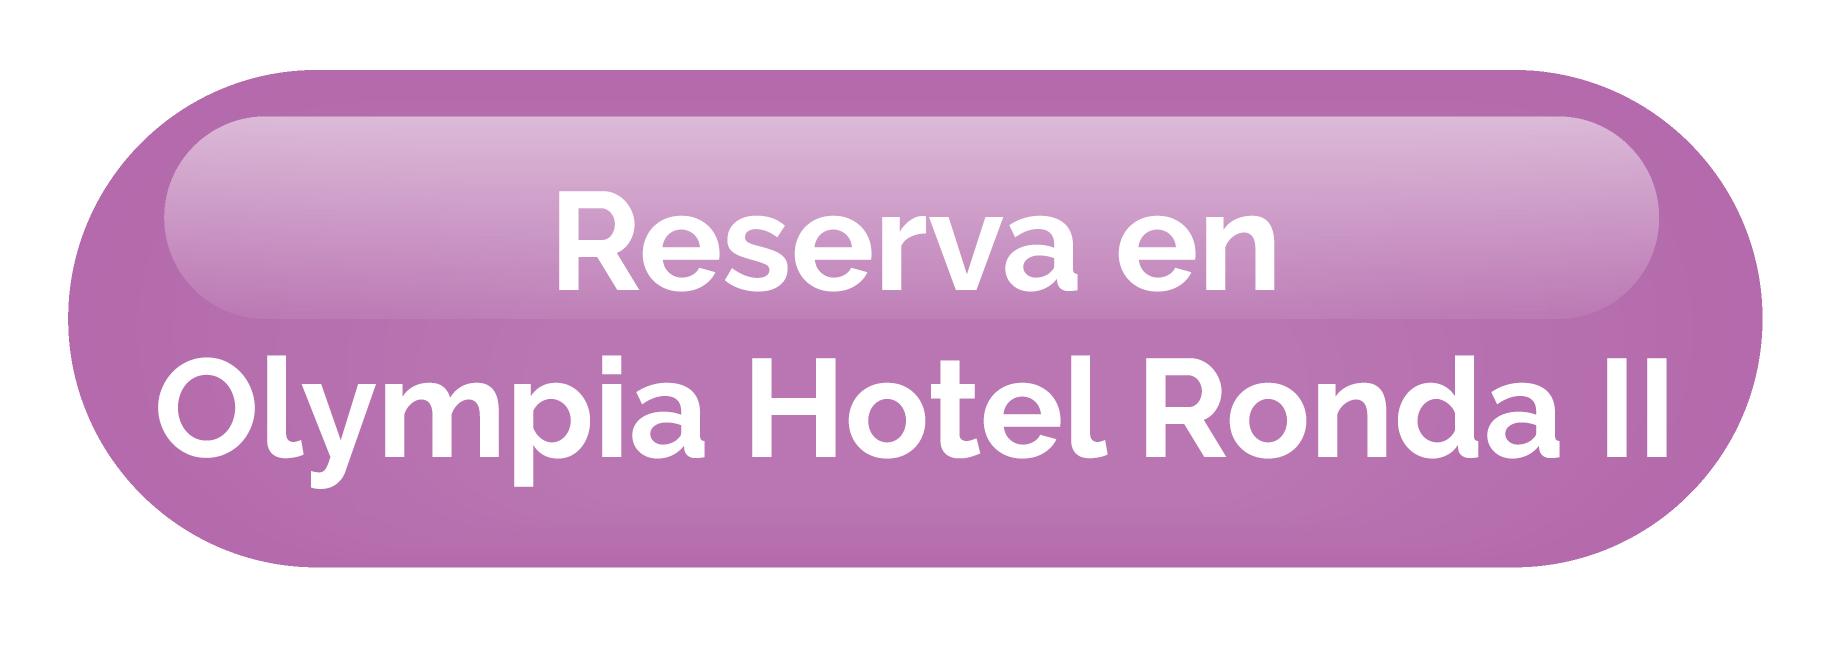 reserva ronda II